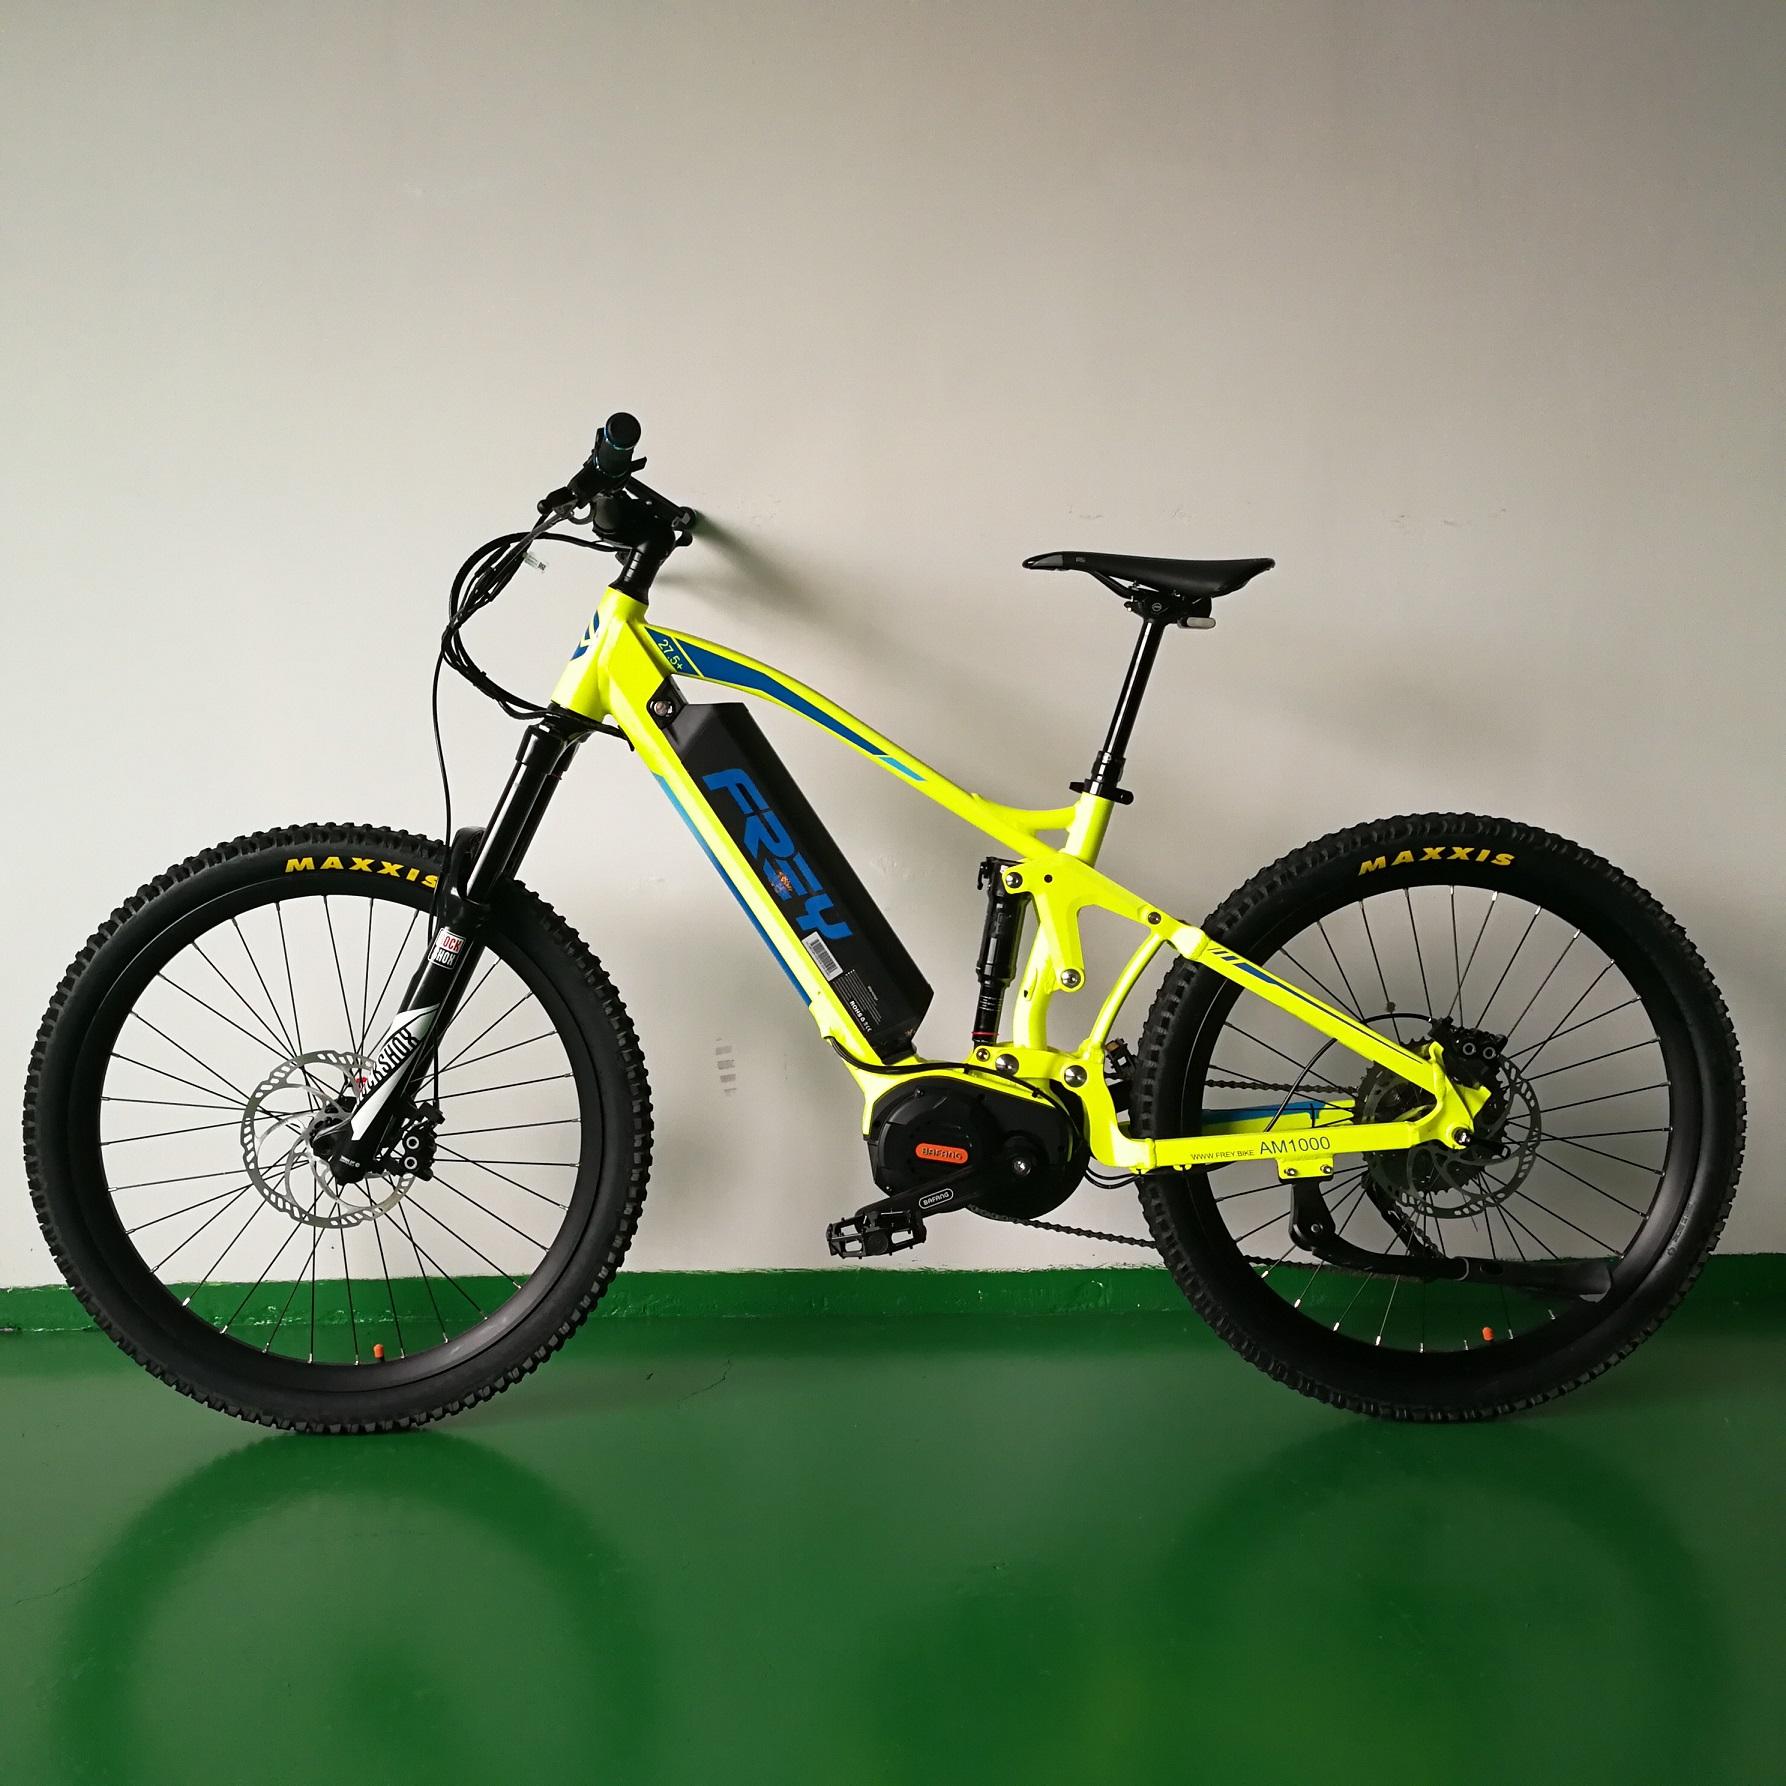 Bafang M620 Full Suspension Electric Mountain Bike /emtb G510 1000 Motor  -  Buy Electric Mountain Bicycle,Bafang M500/600 Mountain Bike,Full